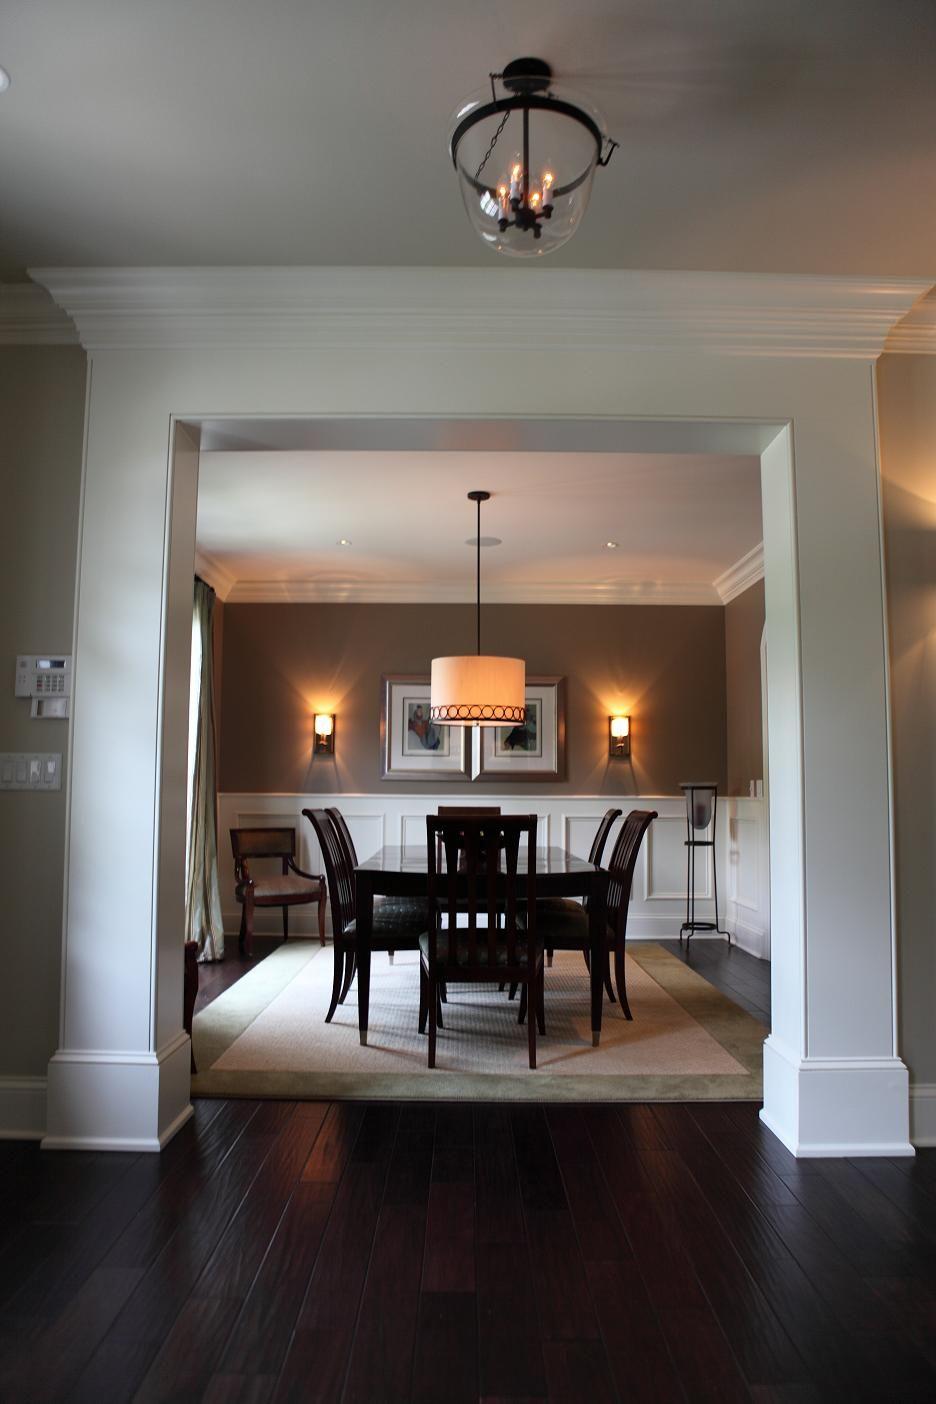 Doorway Column Casing Home Decor Home Interior Trim